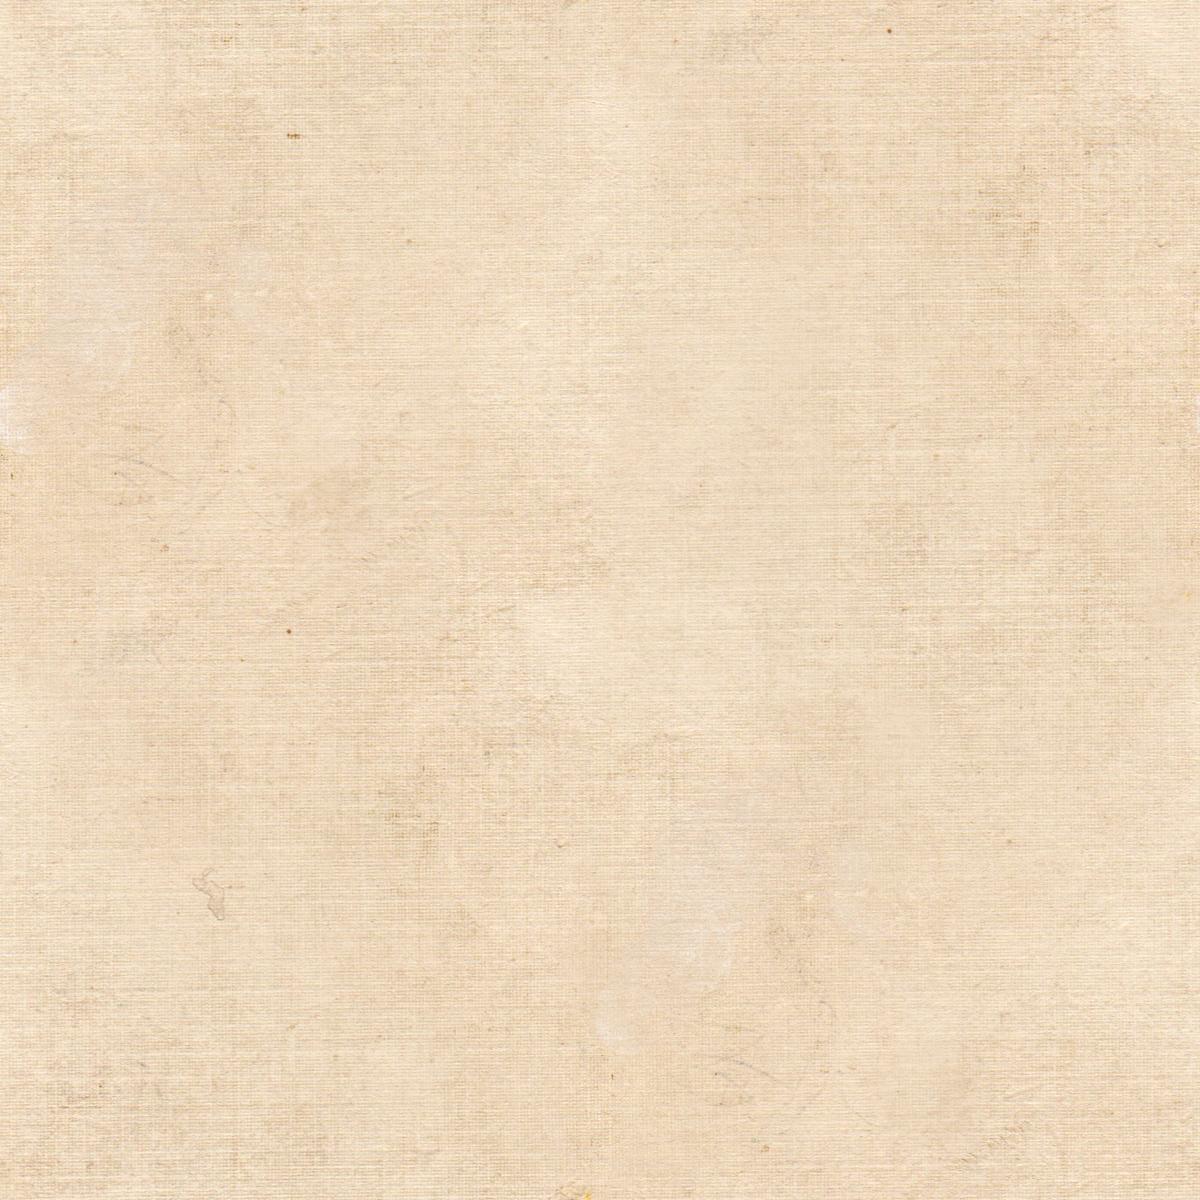 Free Seamless Background Textures Texture